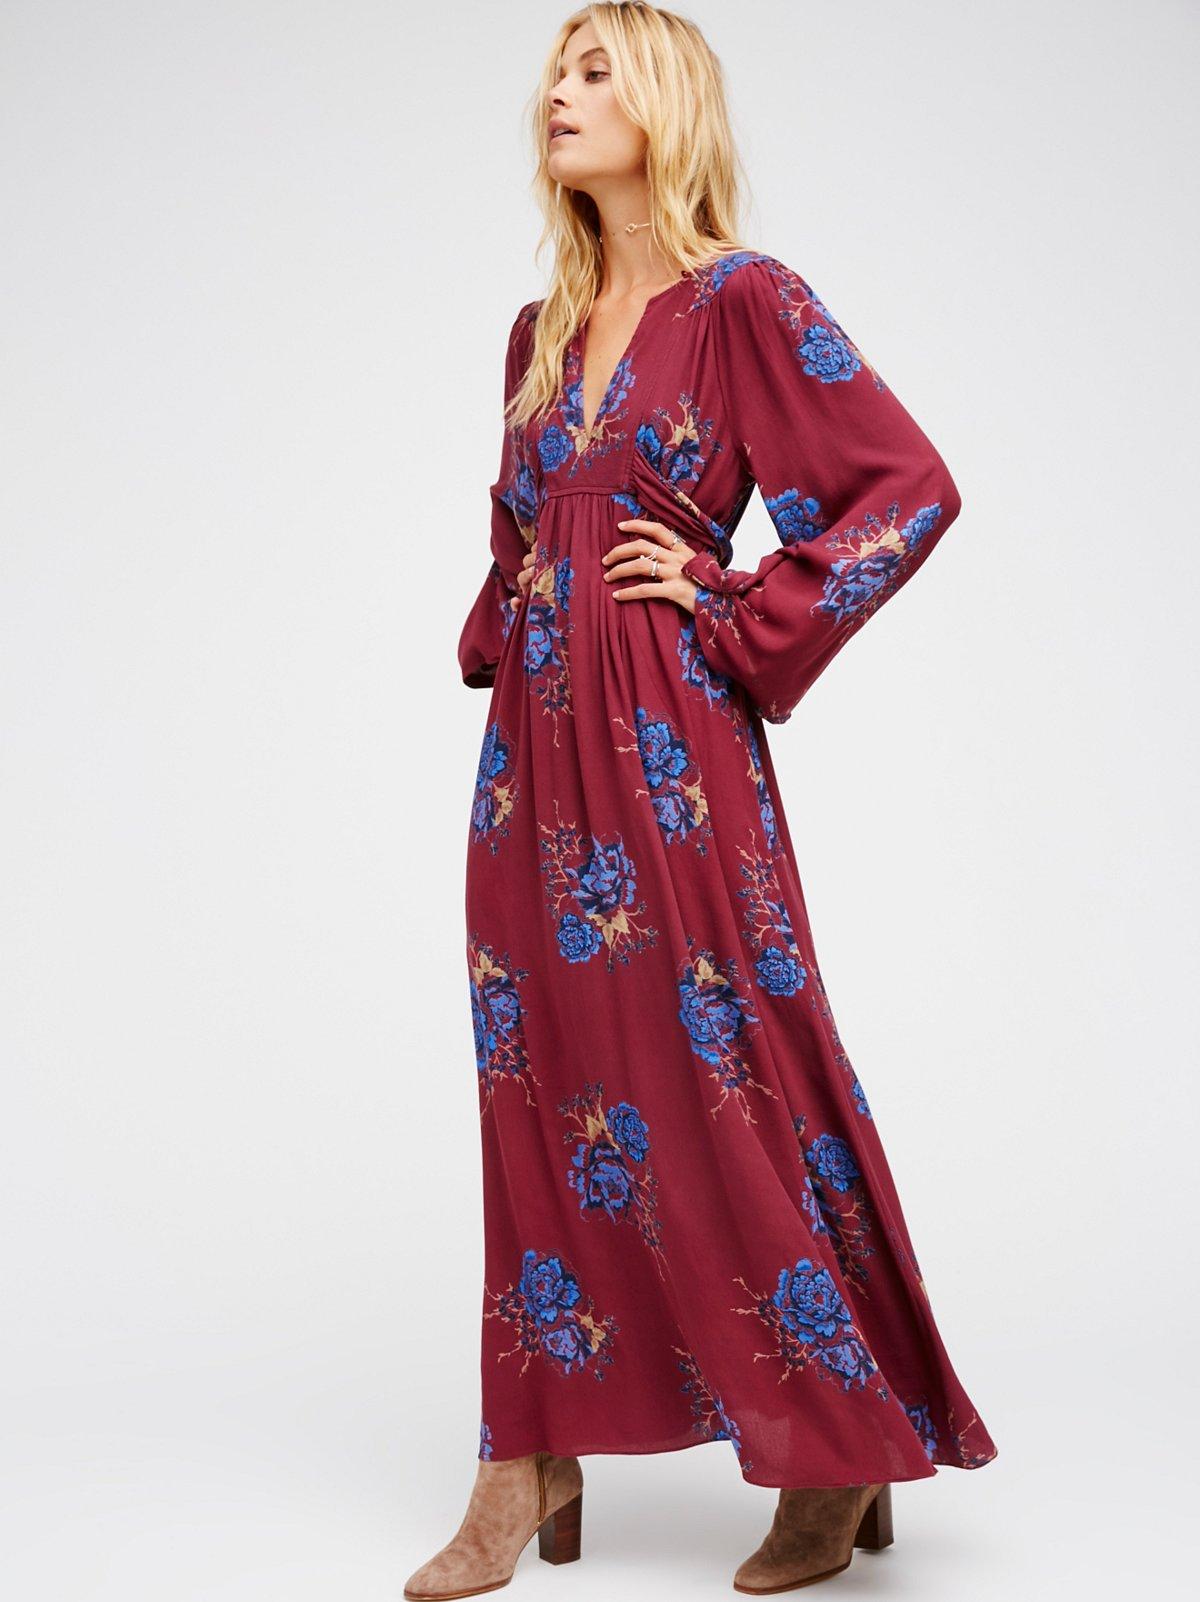 Wild Laurel Maxi Dress